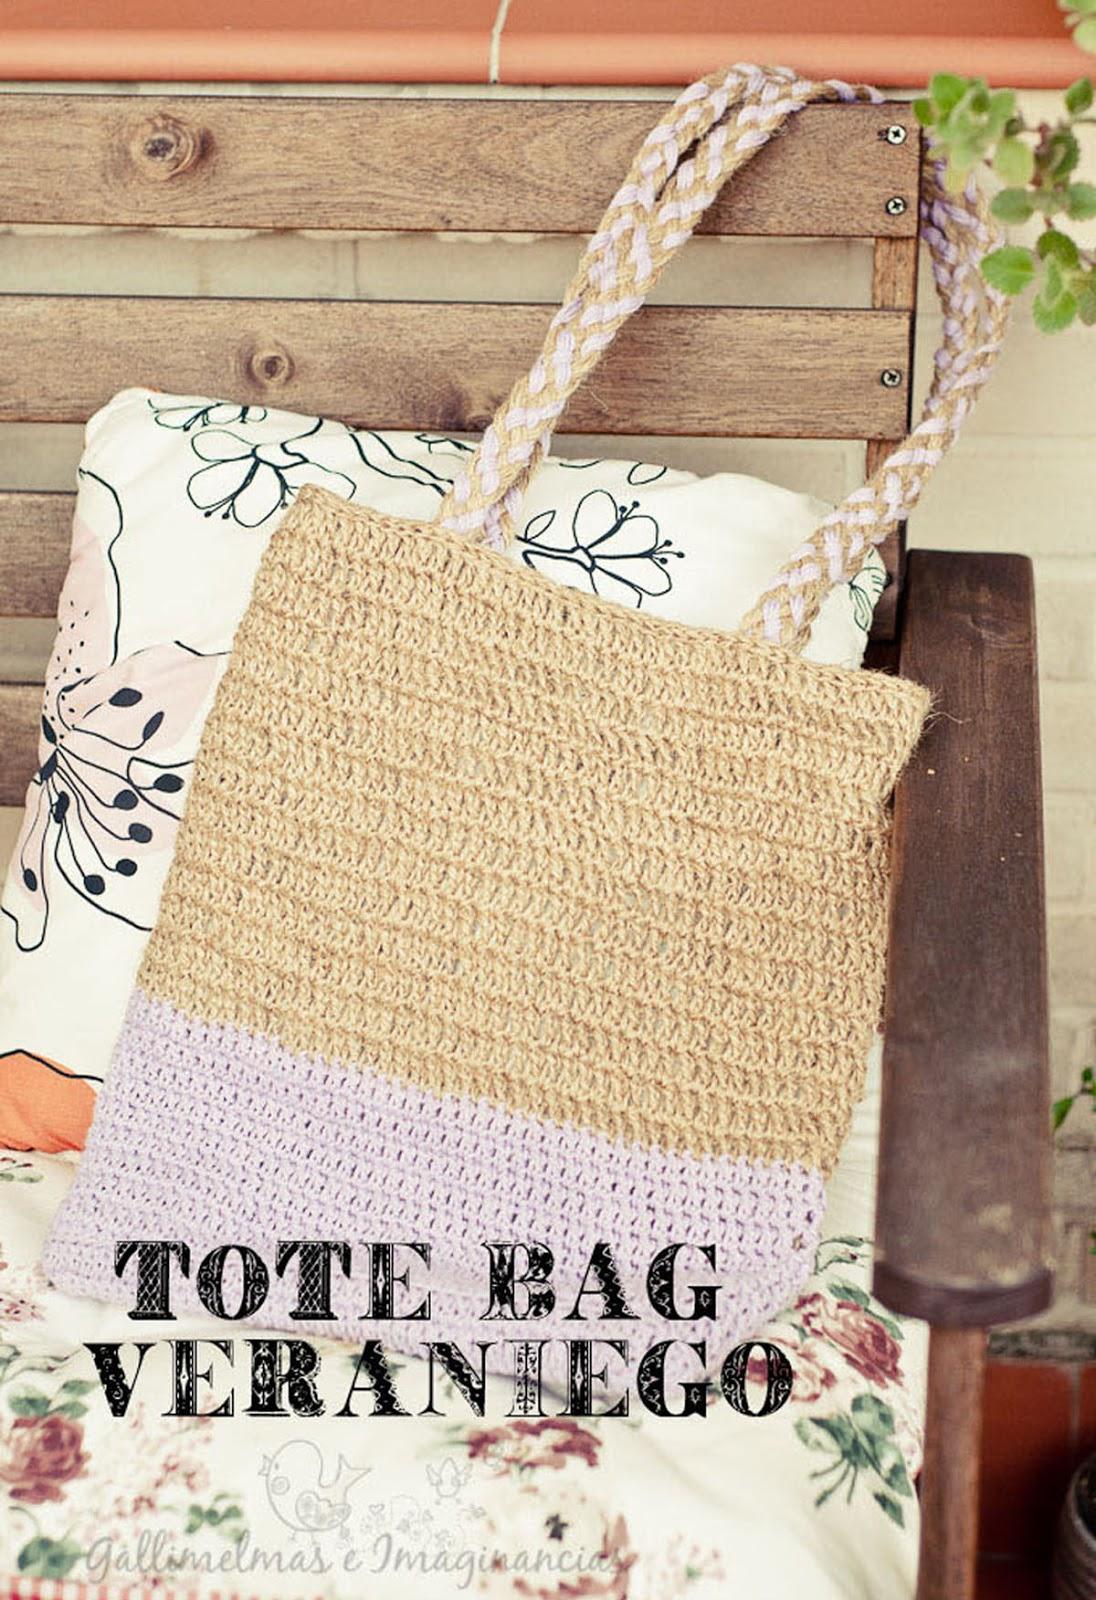 Free Patterns: Tote Bag Veraniego de Ganchillo | Gallimelmas e ...